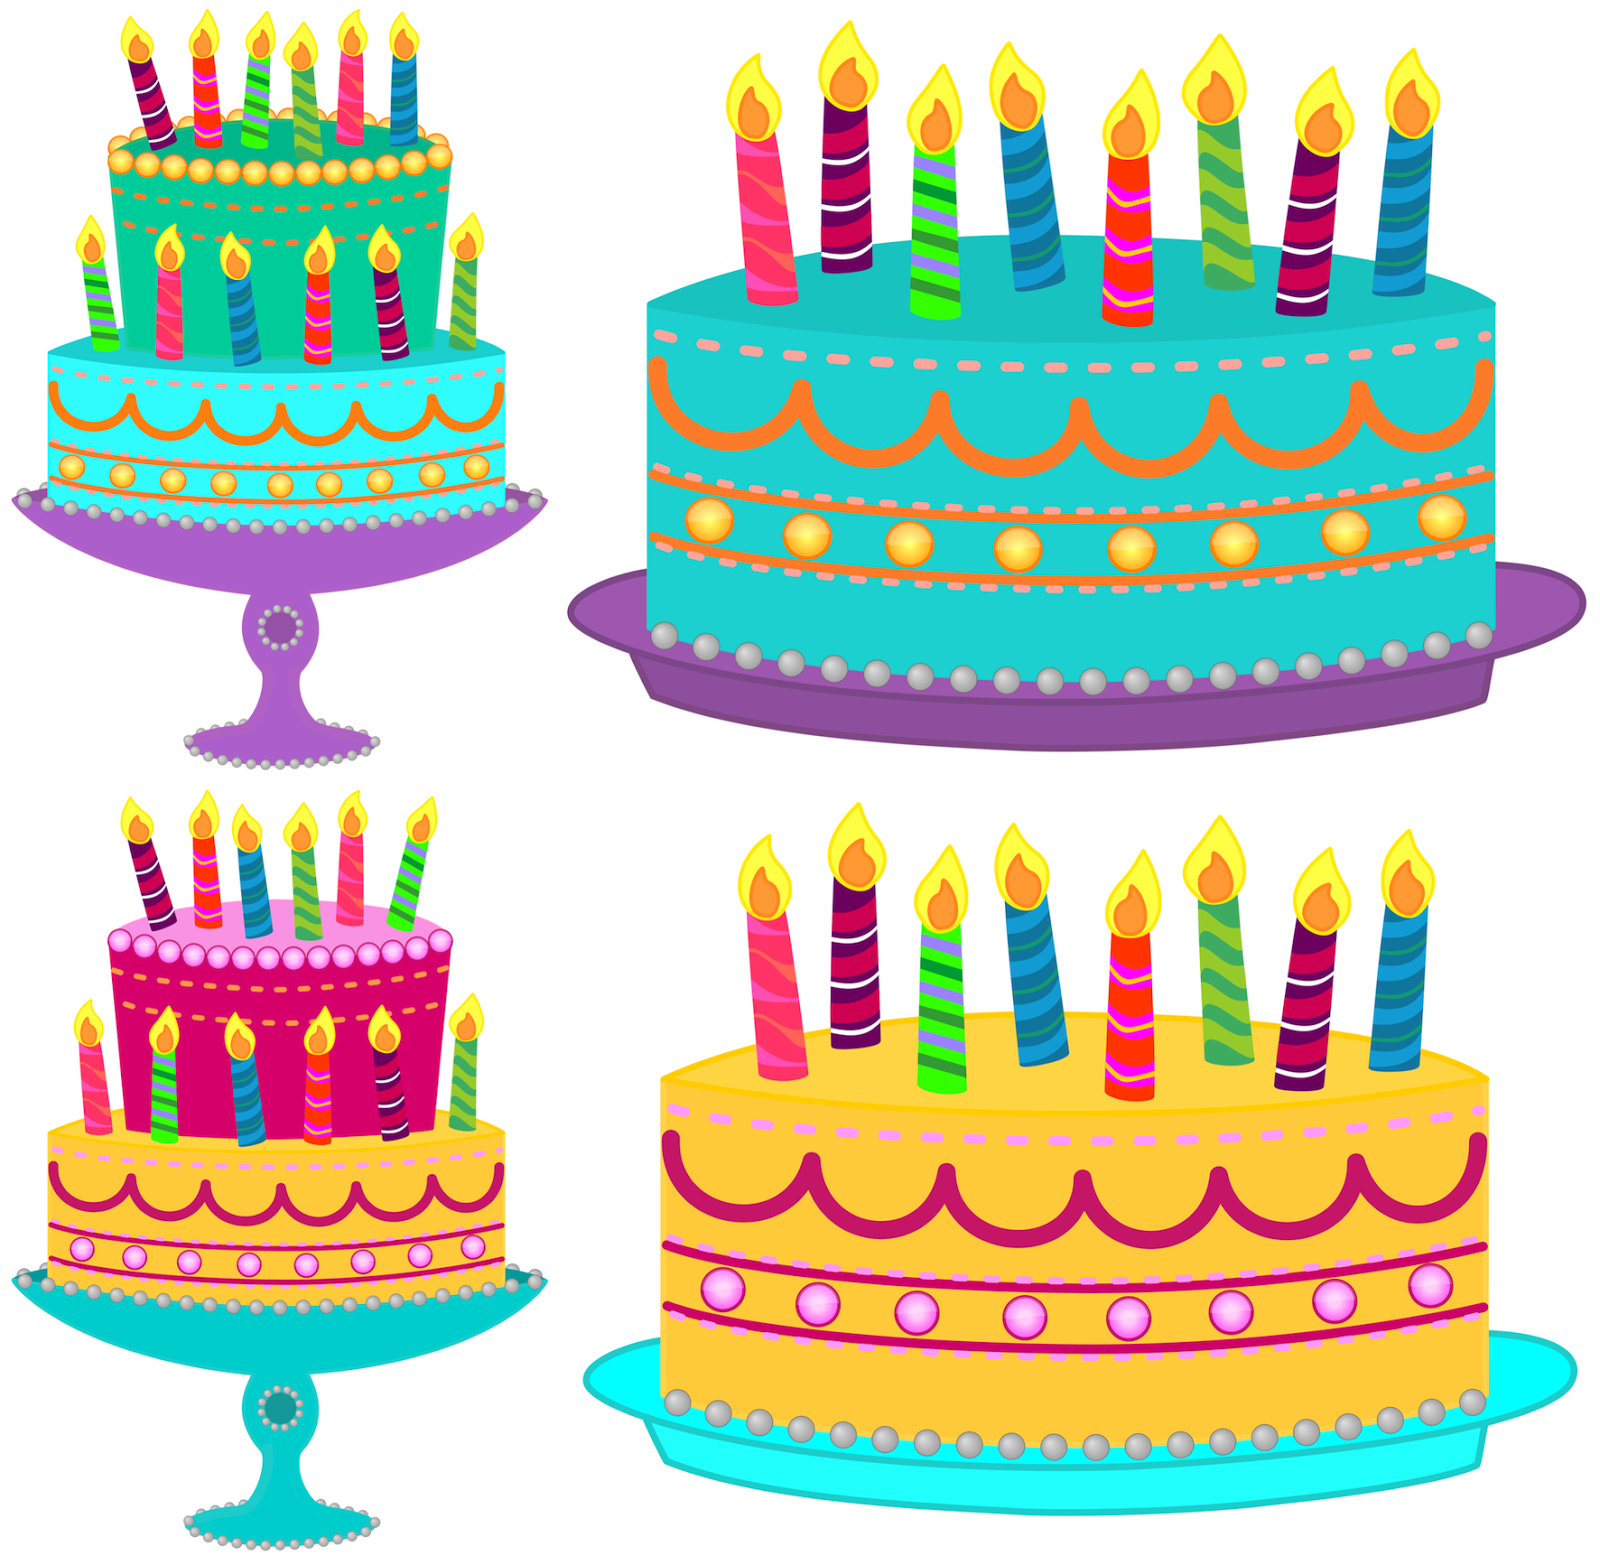 50 Birthday Cake Clipart.